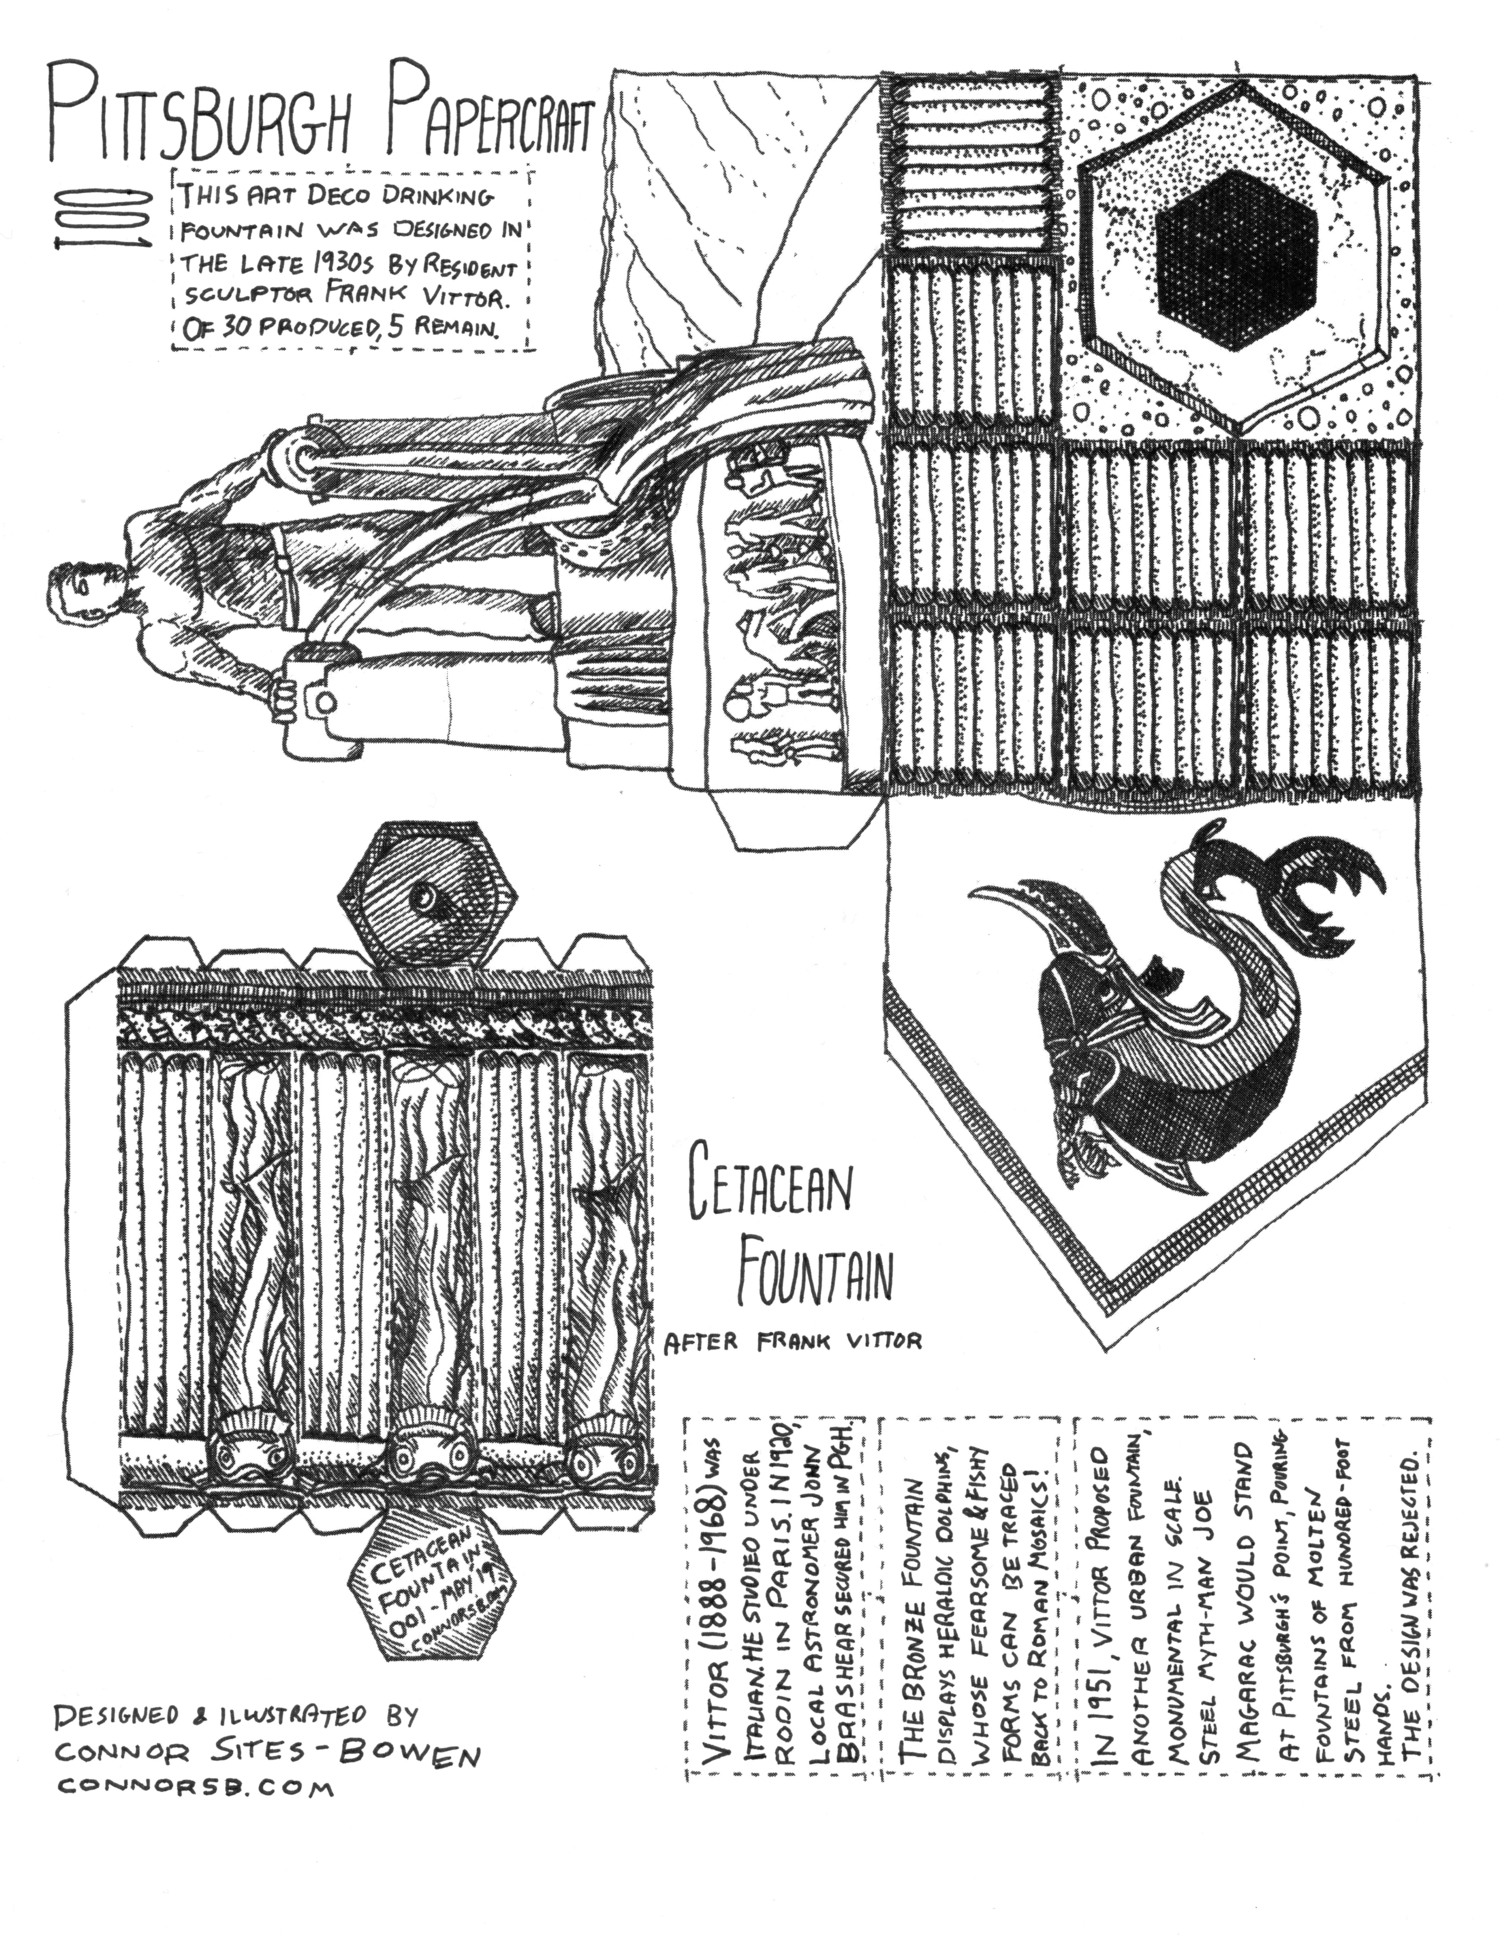 (PDF) Pittsburgh Papercraft 001: Cetacean Fountain — Connor Sites-Bowen